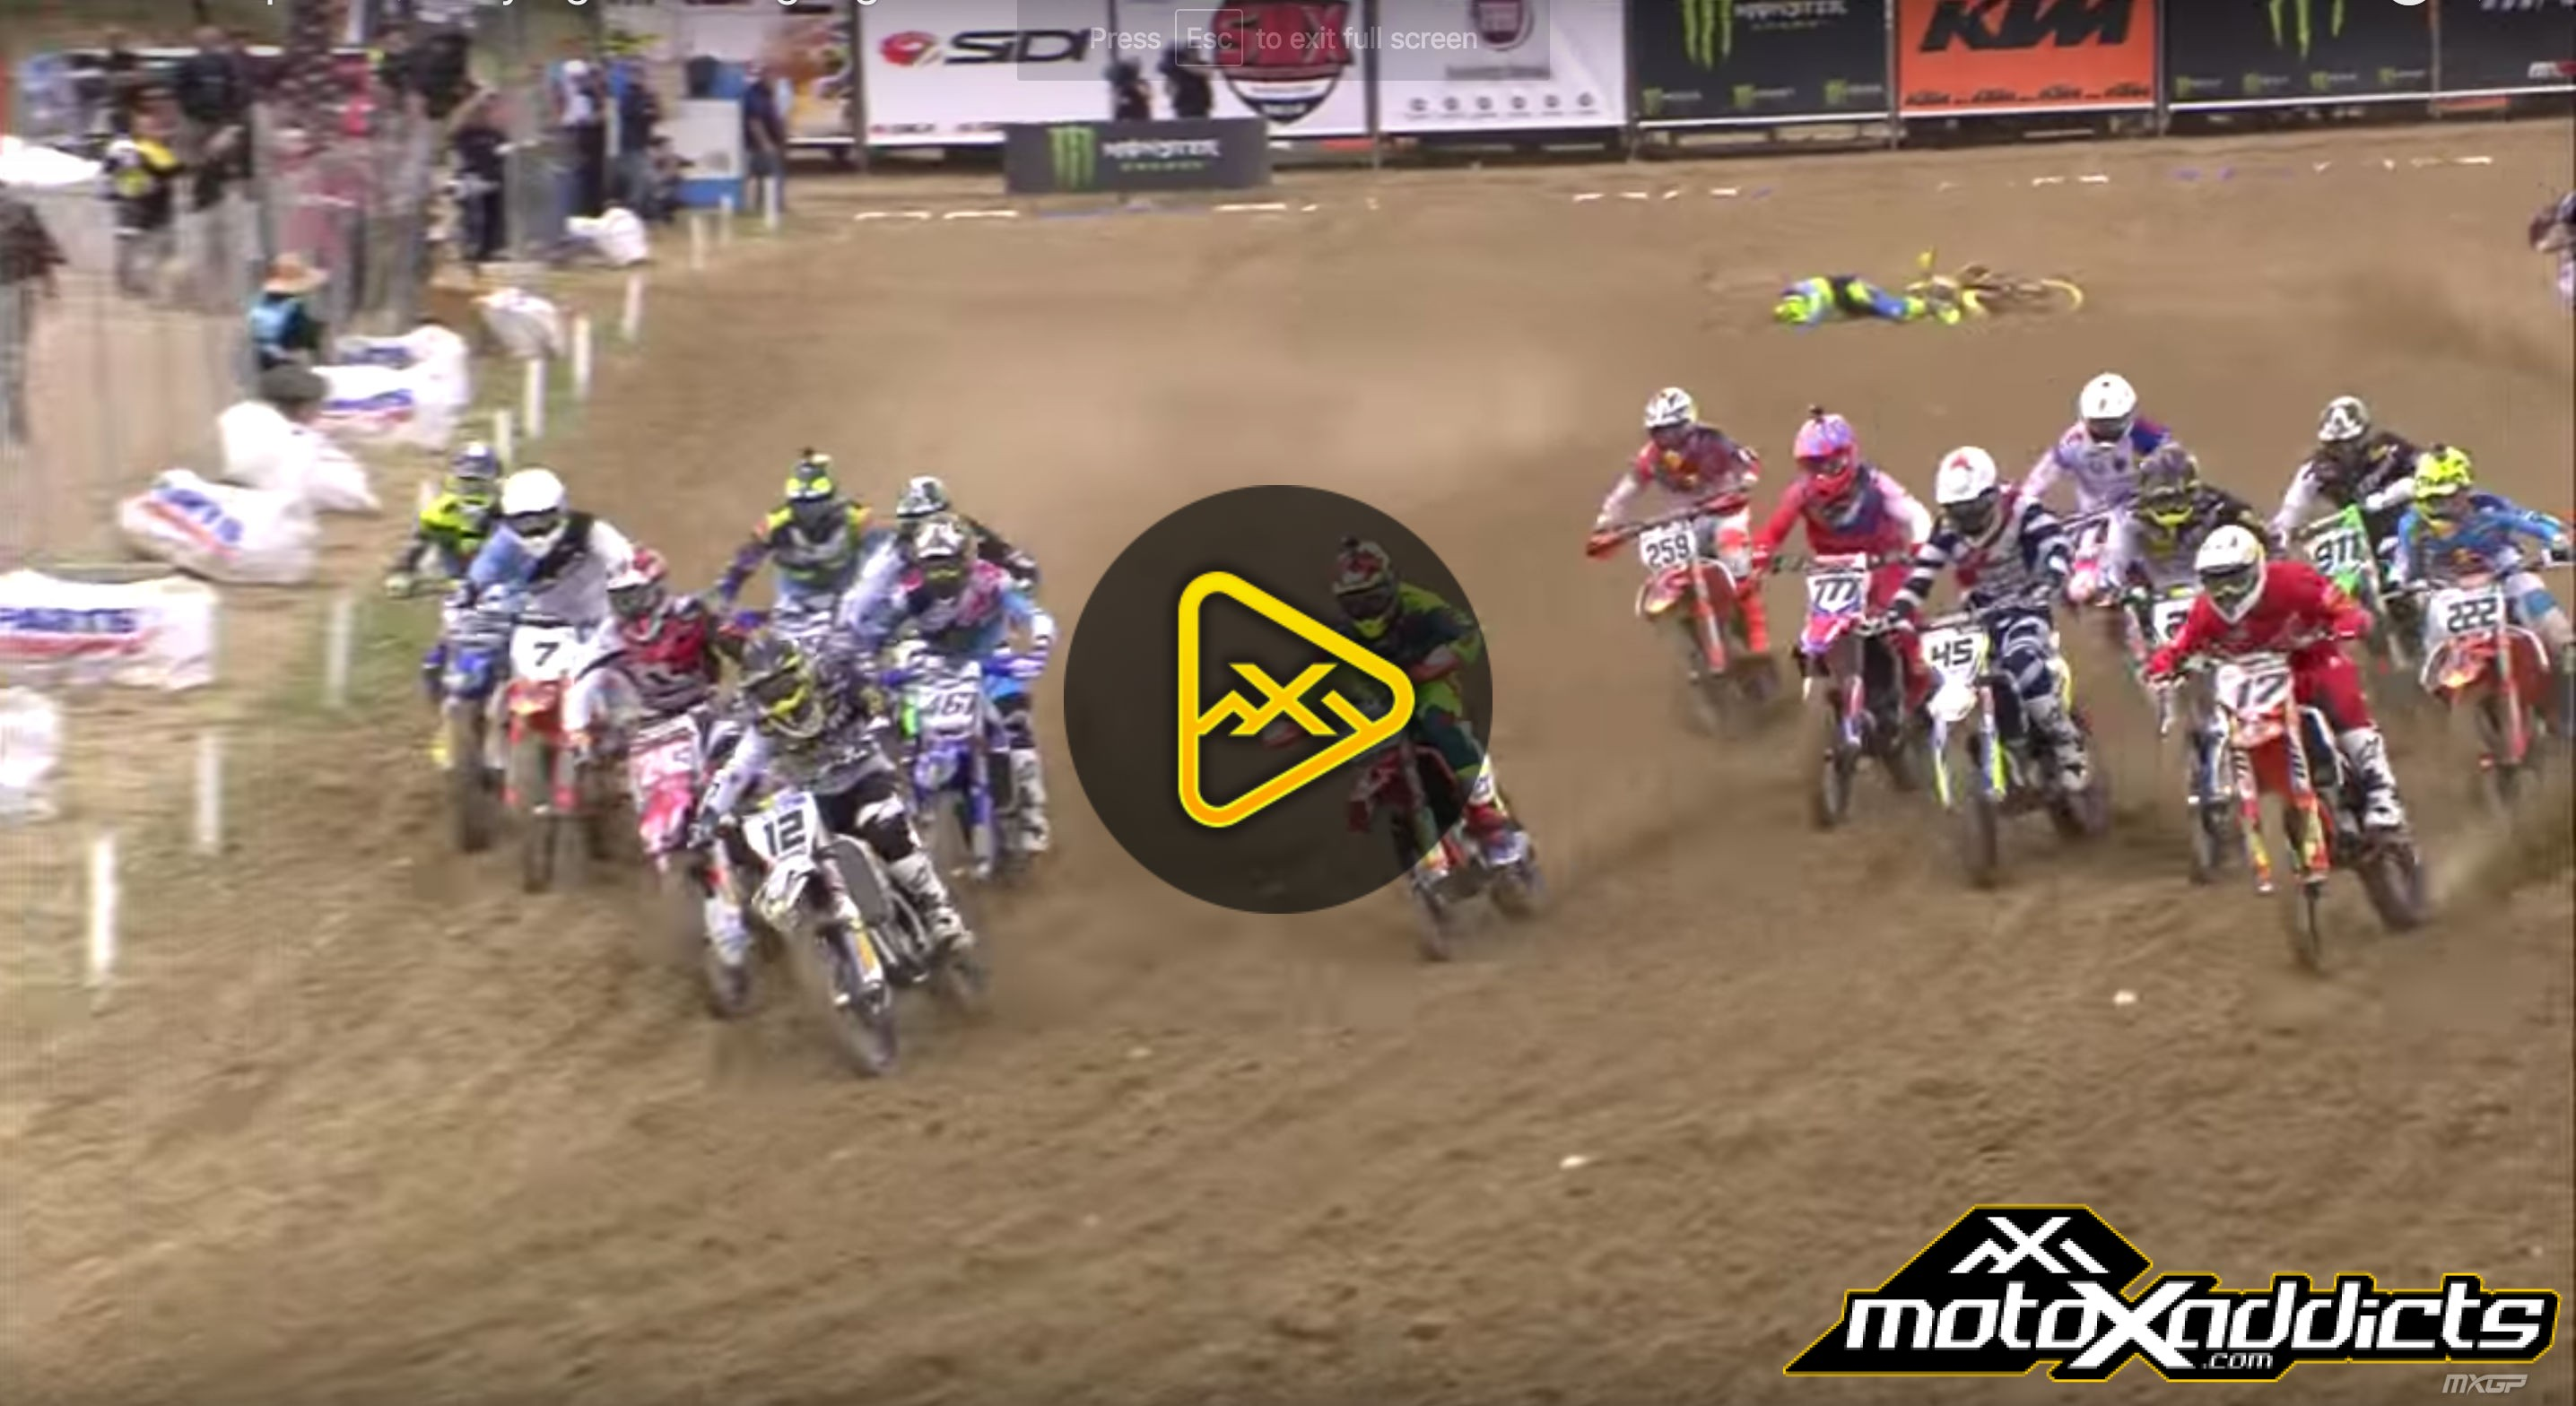 MXGP Qualifying Race Highlights – 2016 MXGP of Spain